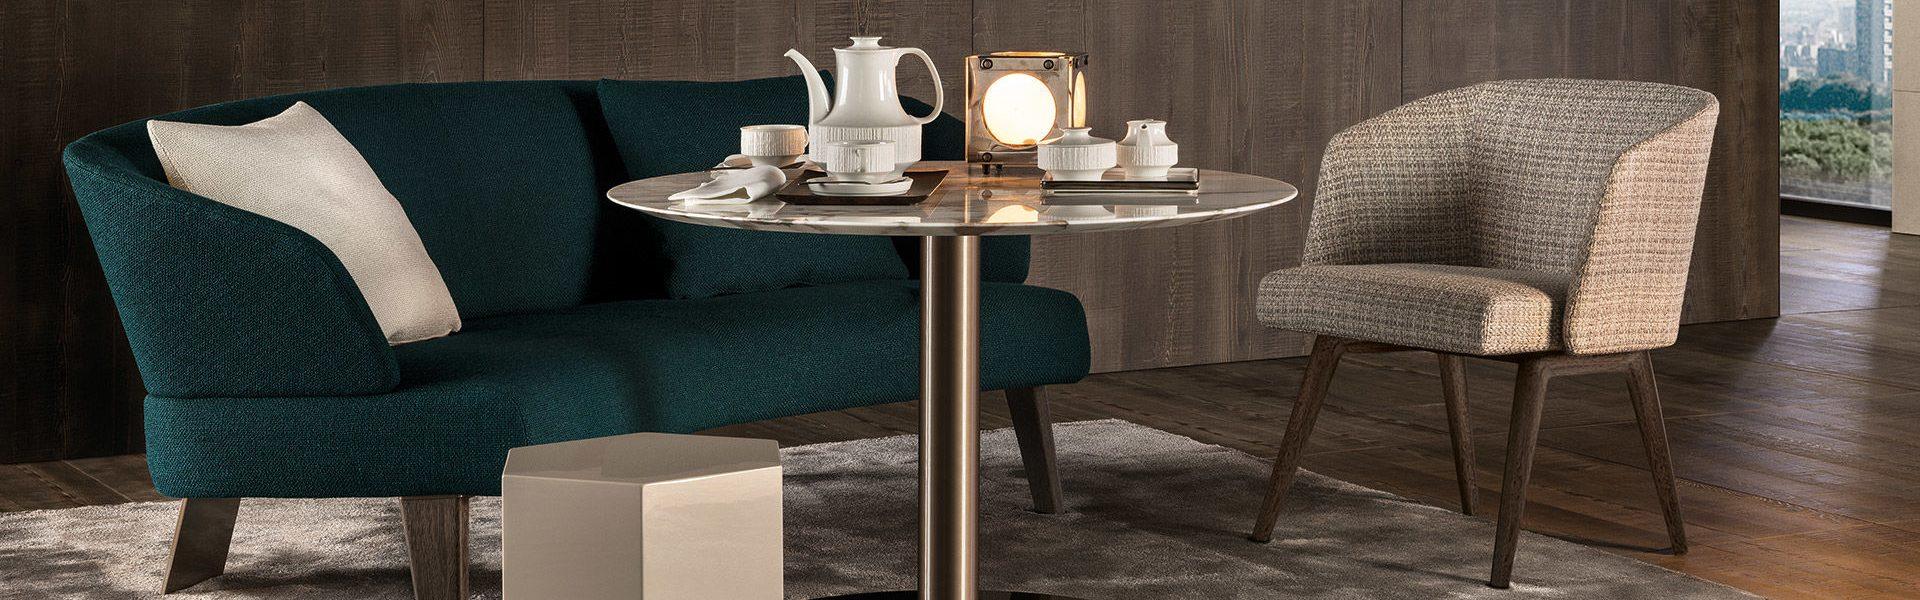 Bellagio Lounge Bronze Table